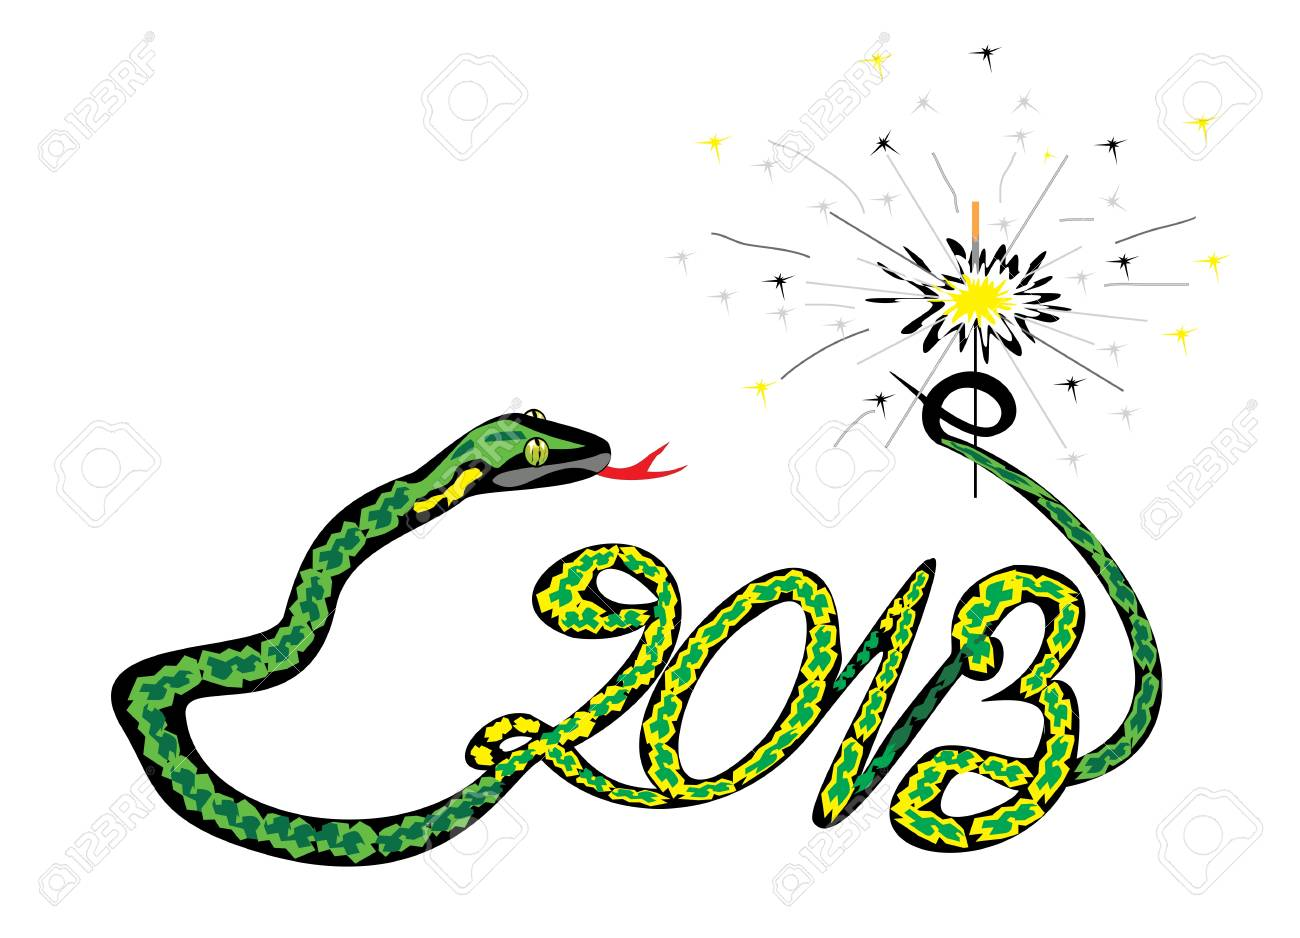 green snake 2013 with a sparkler Stock Vector - 14753707